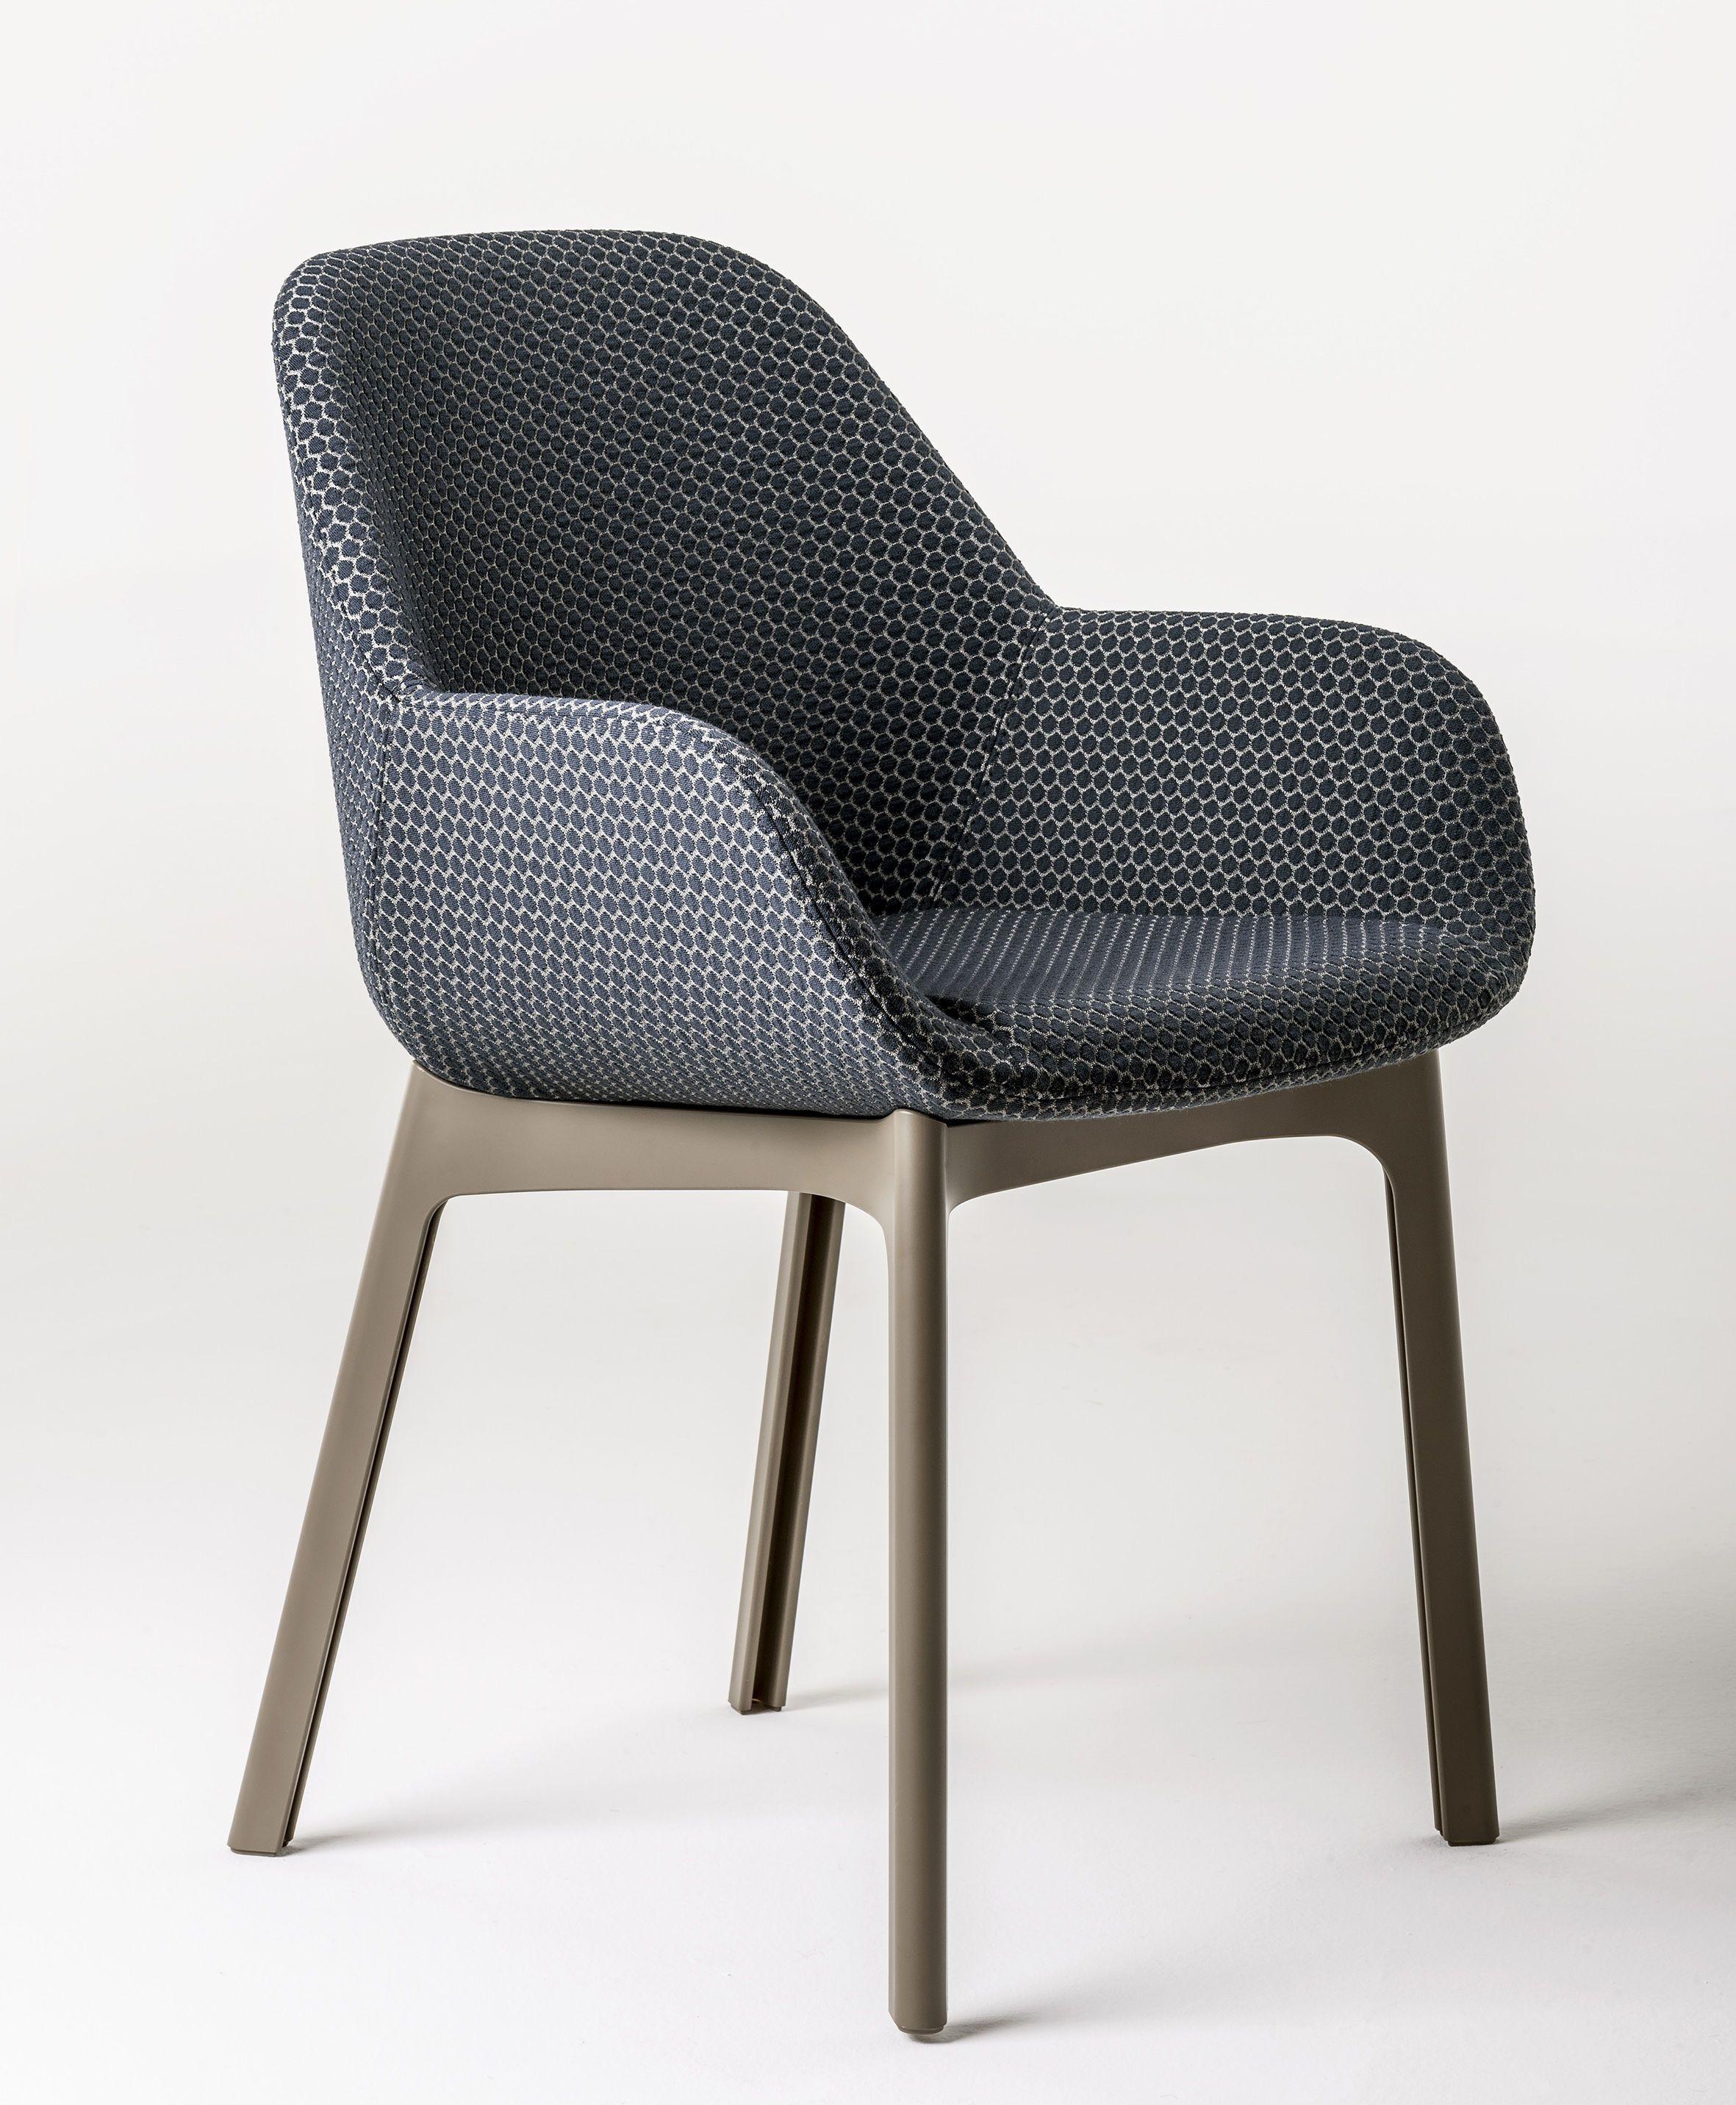 fauteuil clap tissu graphite pieds tourterelle kartell